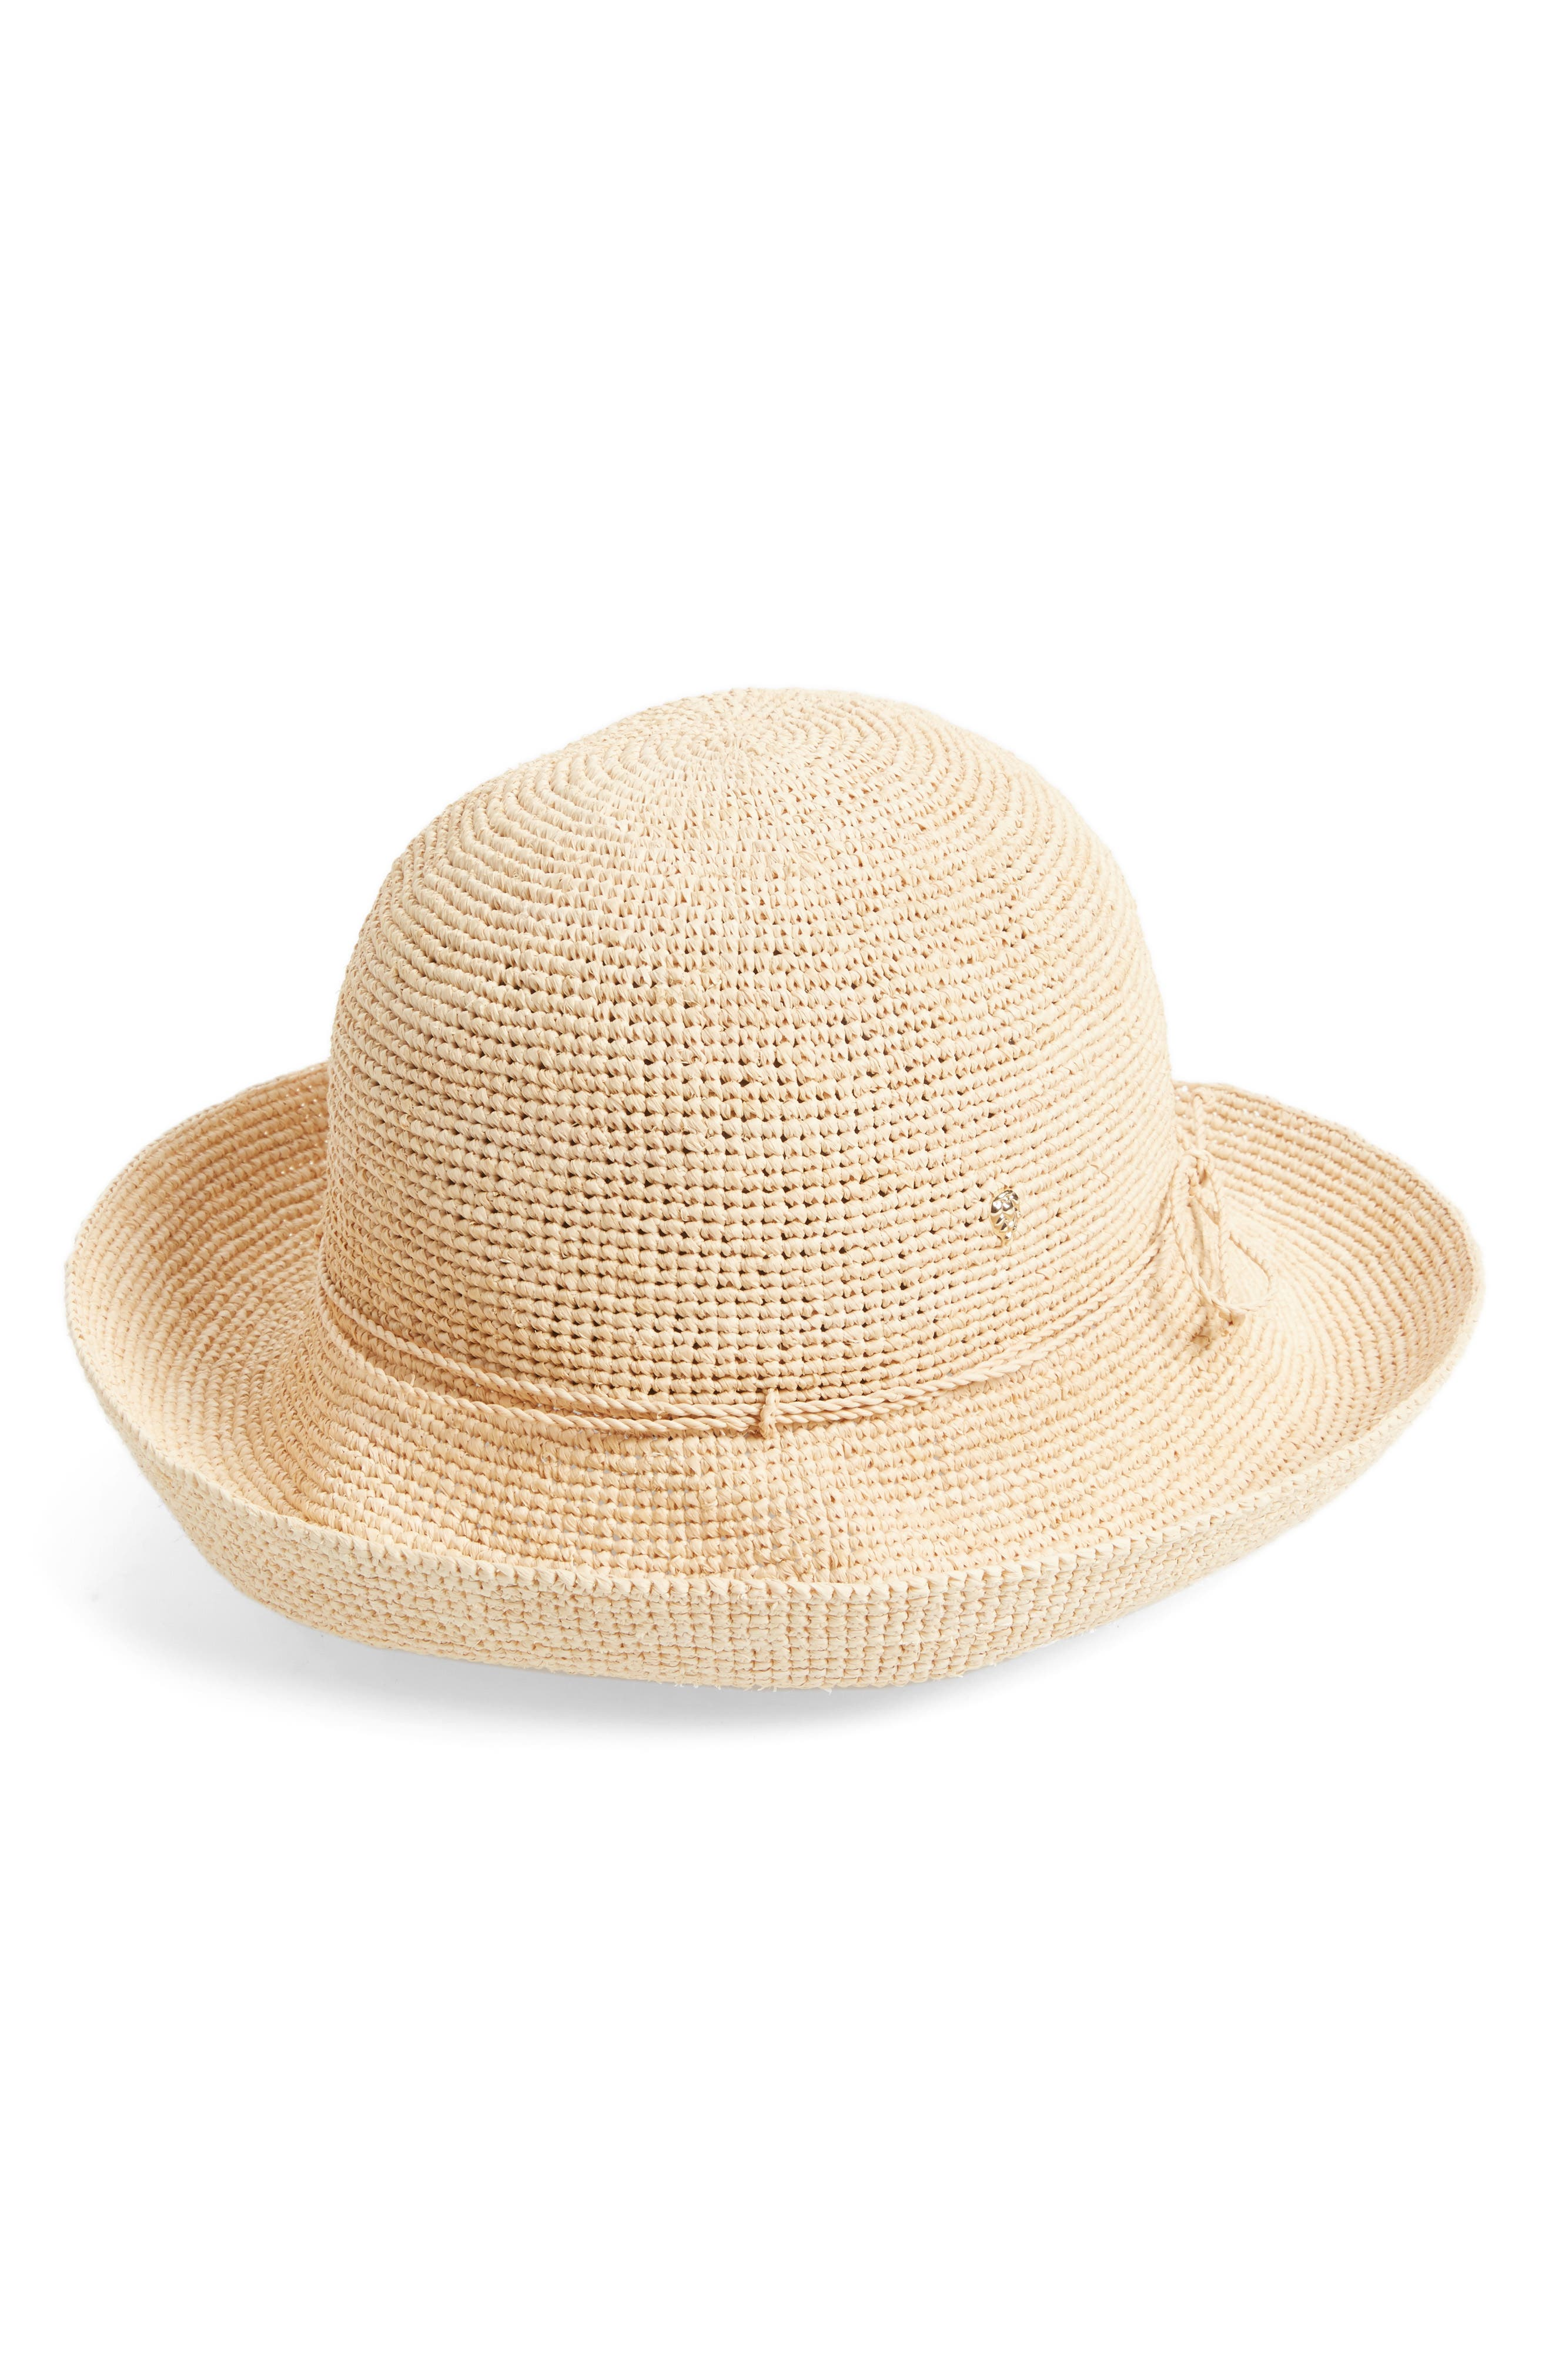 HELEN KAMINSKI 'Provence 10' Packable Raffia Hat, Main, color, NATURAL